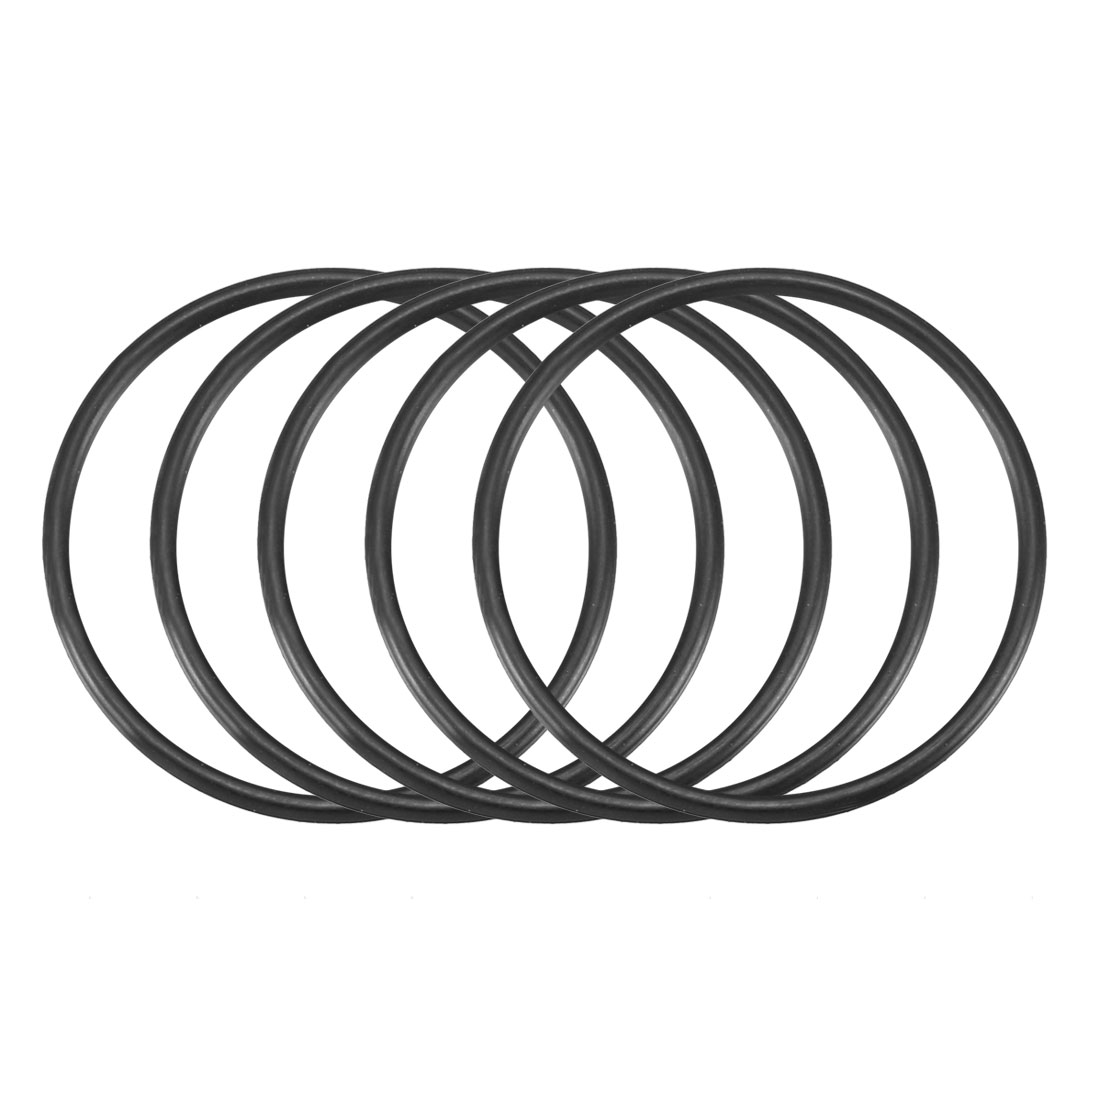 30 Pcs Black 28mm x 1.5mm Nitrile Rubber O Ring NBR Oil Sealing Grommets